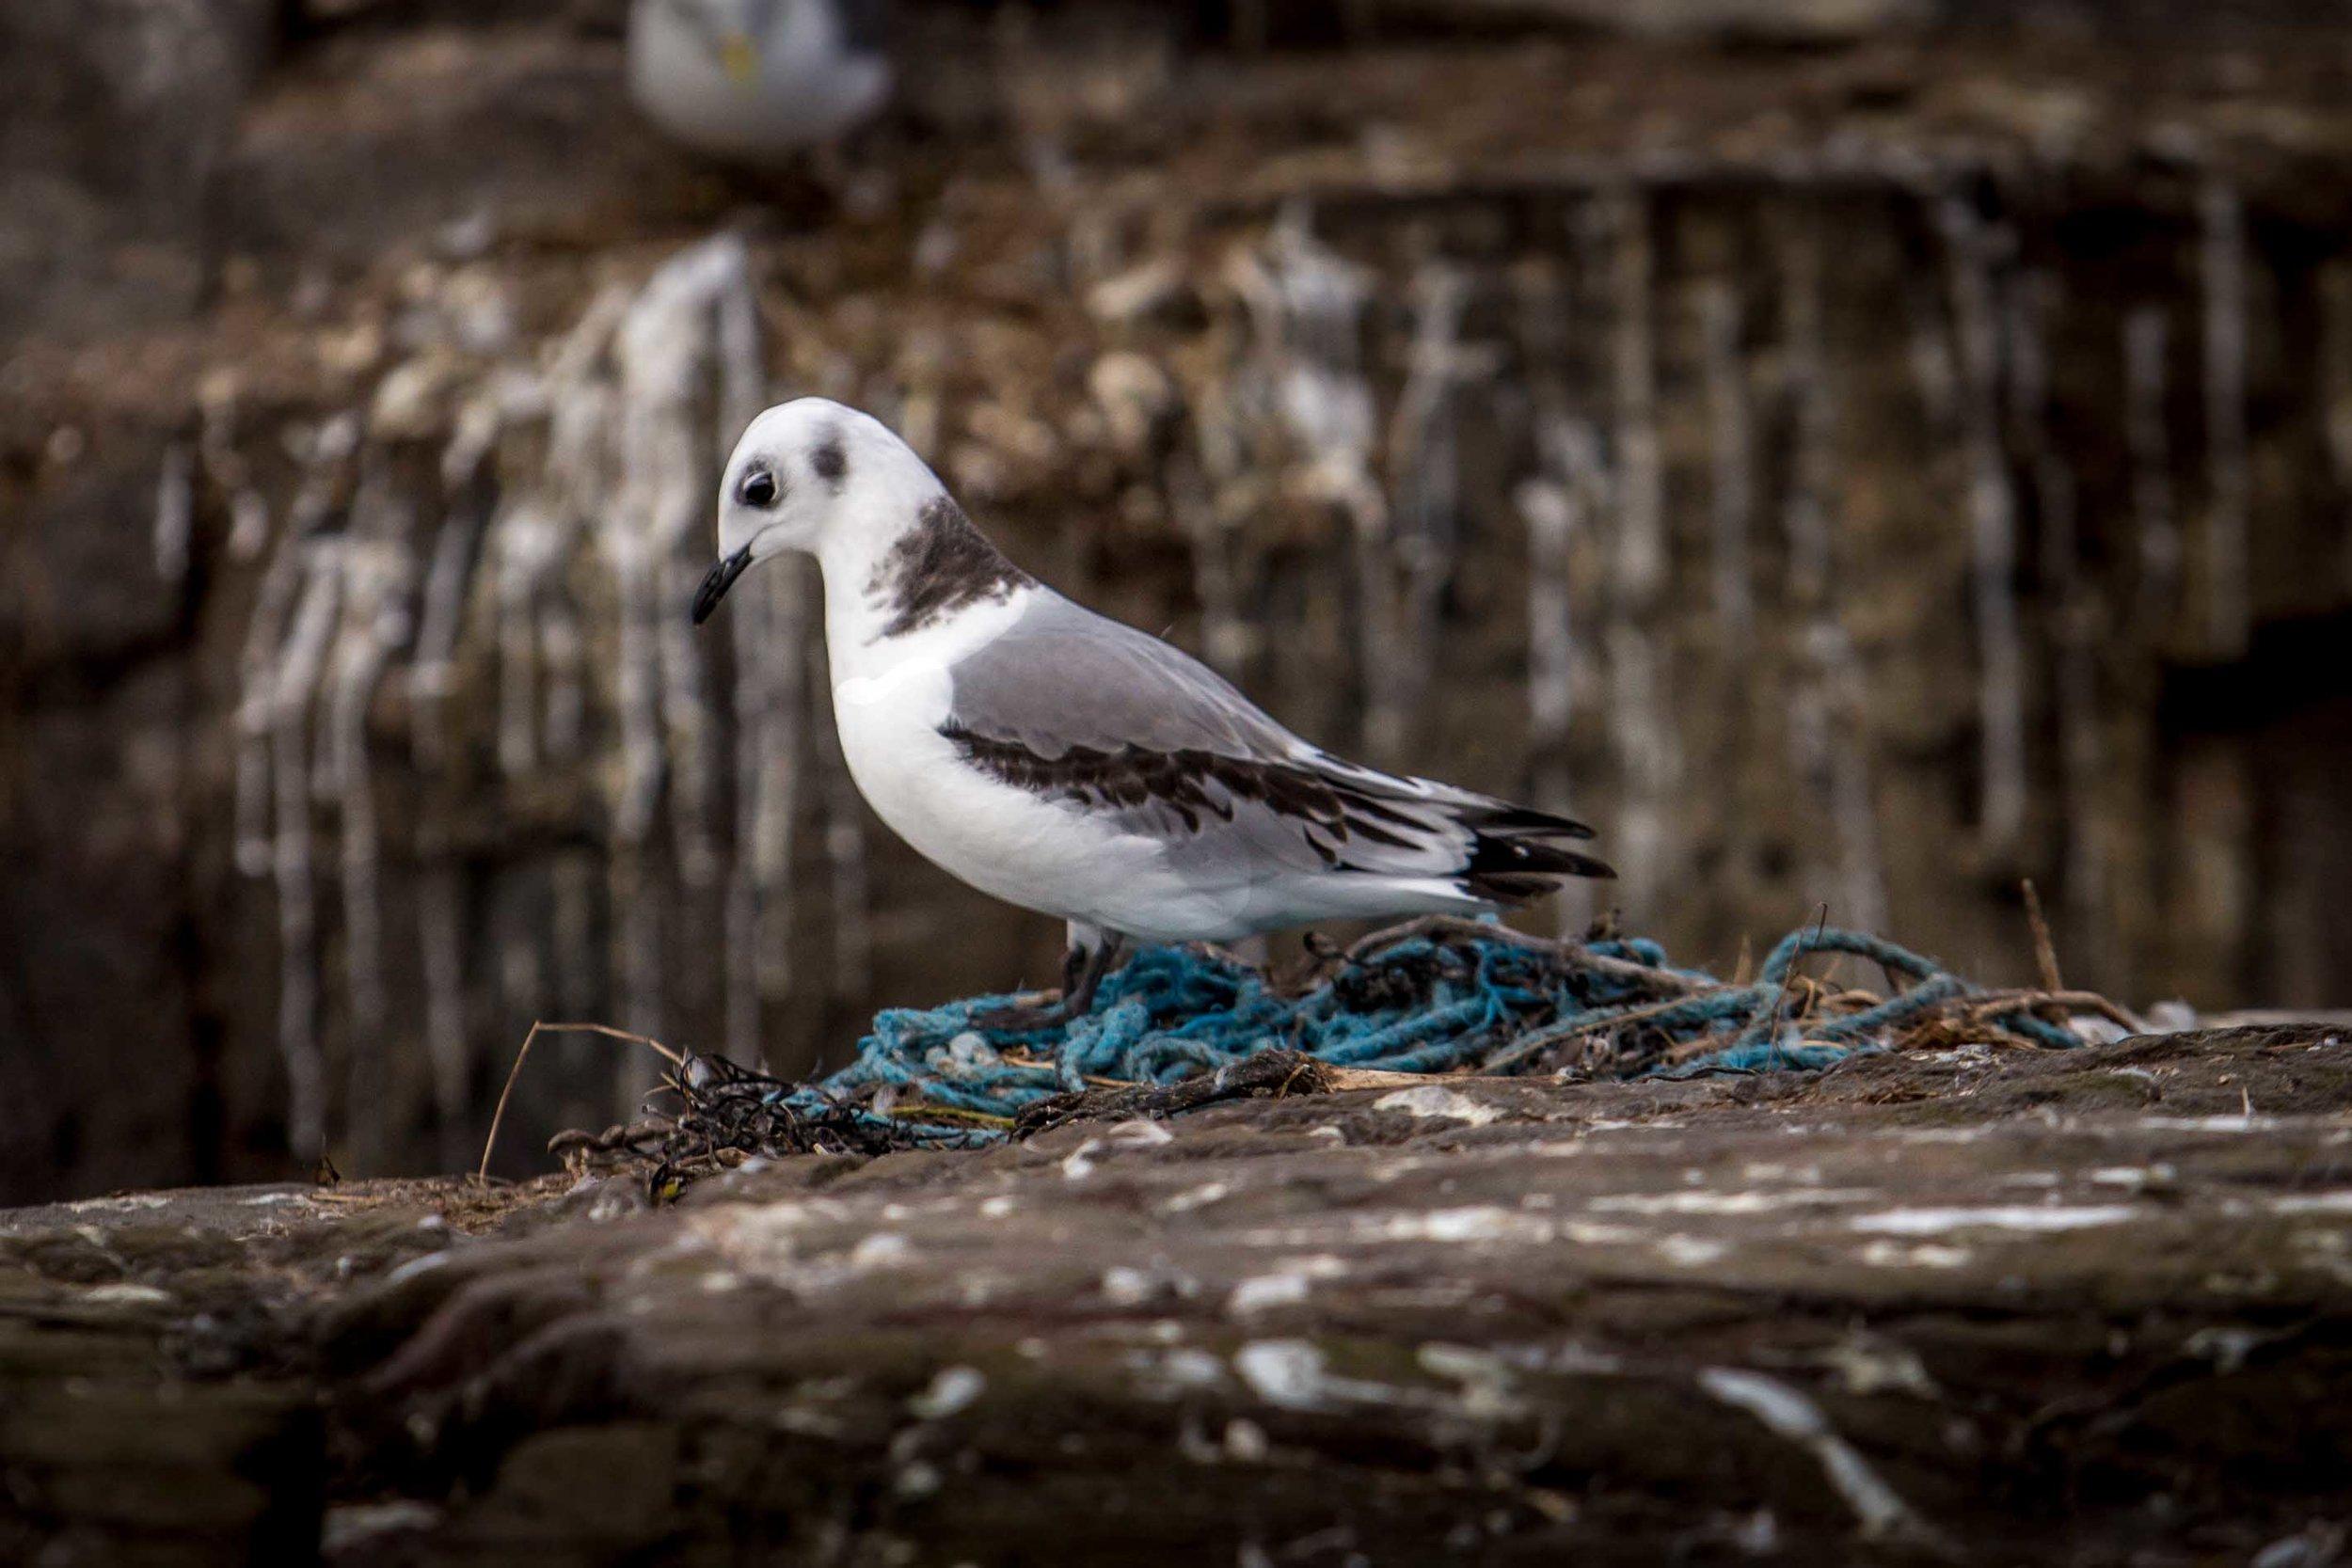 Kittiwake in a nest of plastic